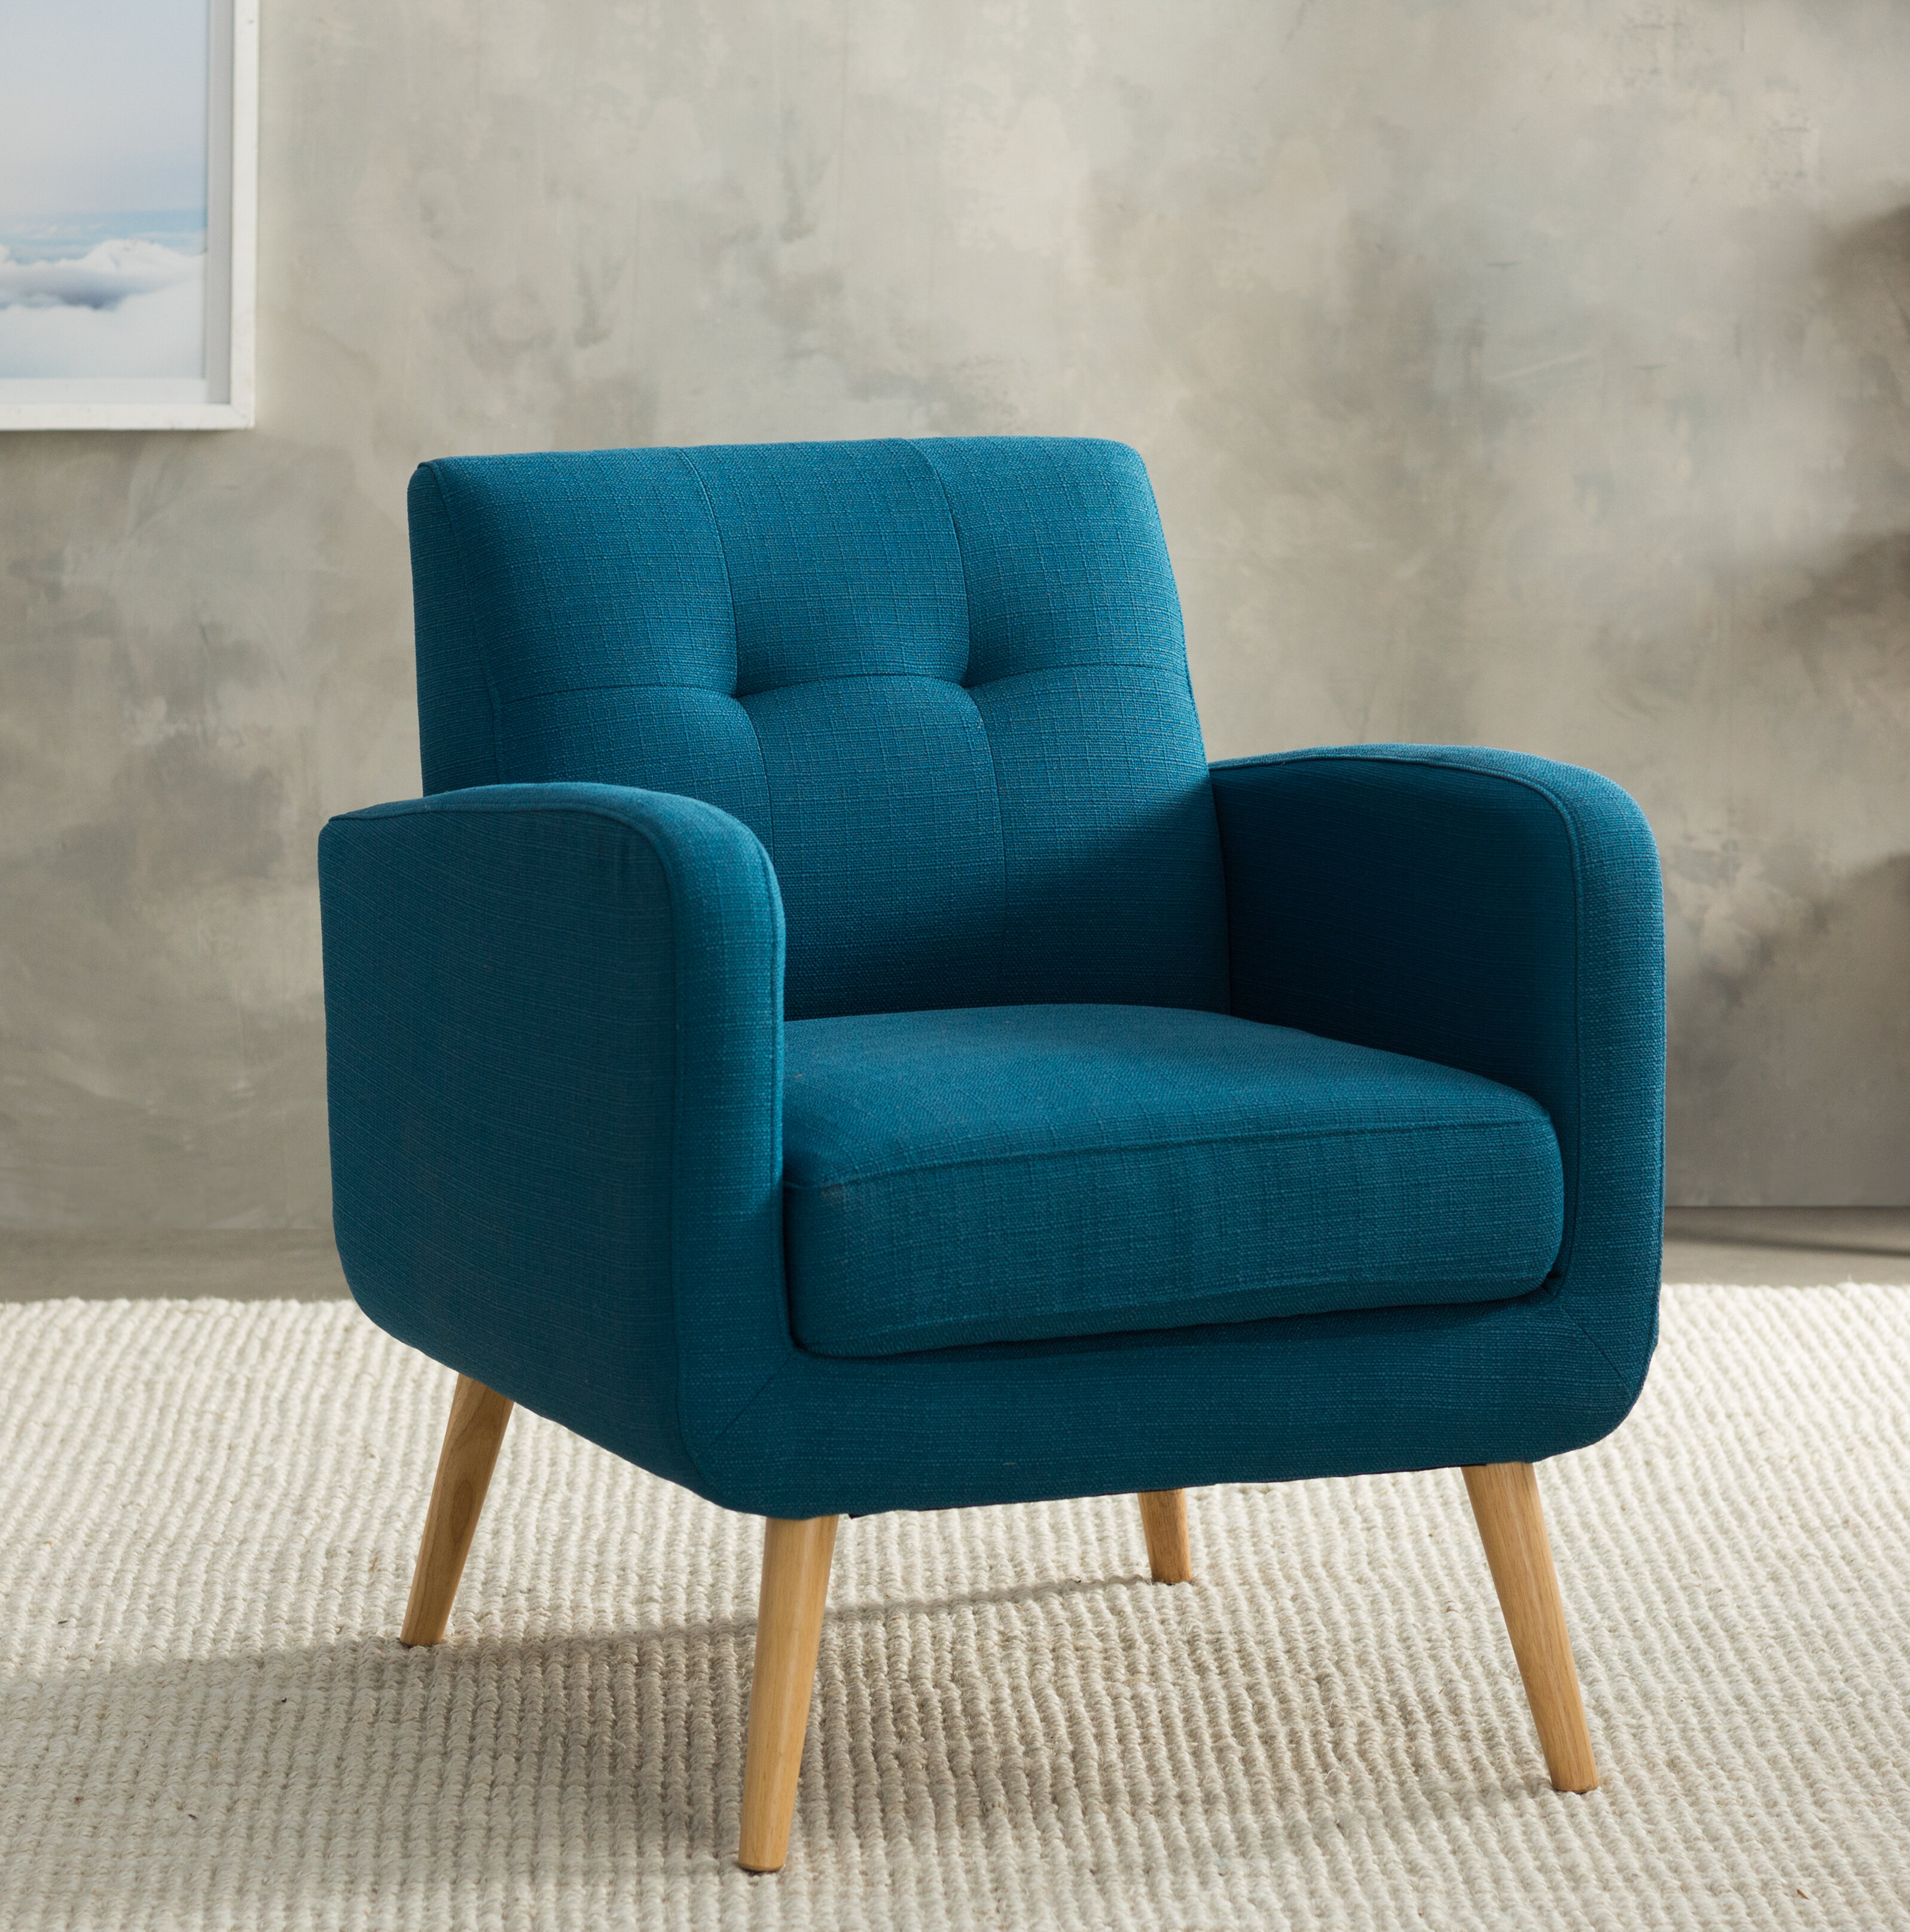 Excellent Modern Contemporary Midcentury Chair Allmodern Inzonedesignstudio Interior Chair Design Inzonedesignstudiocom